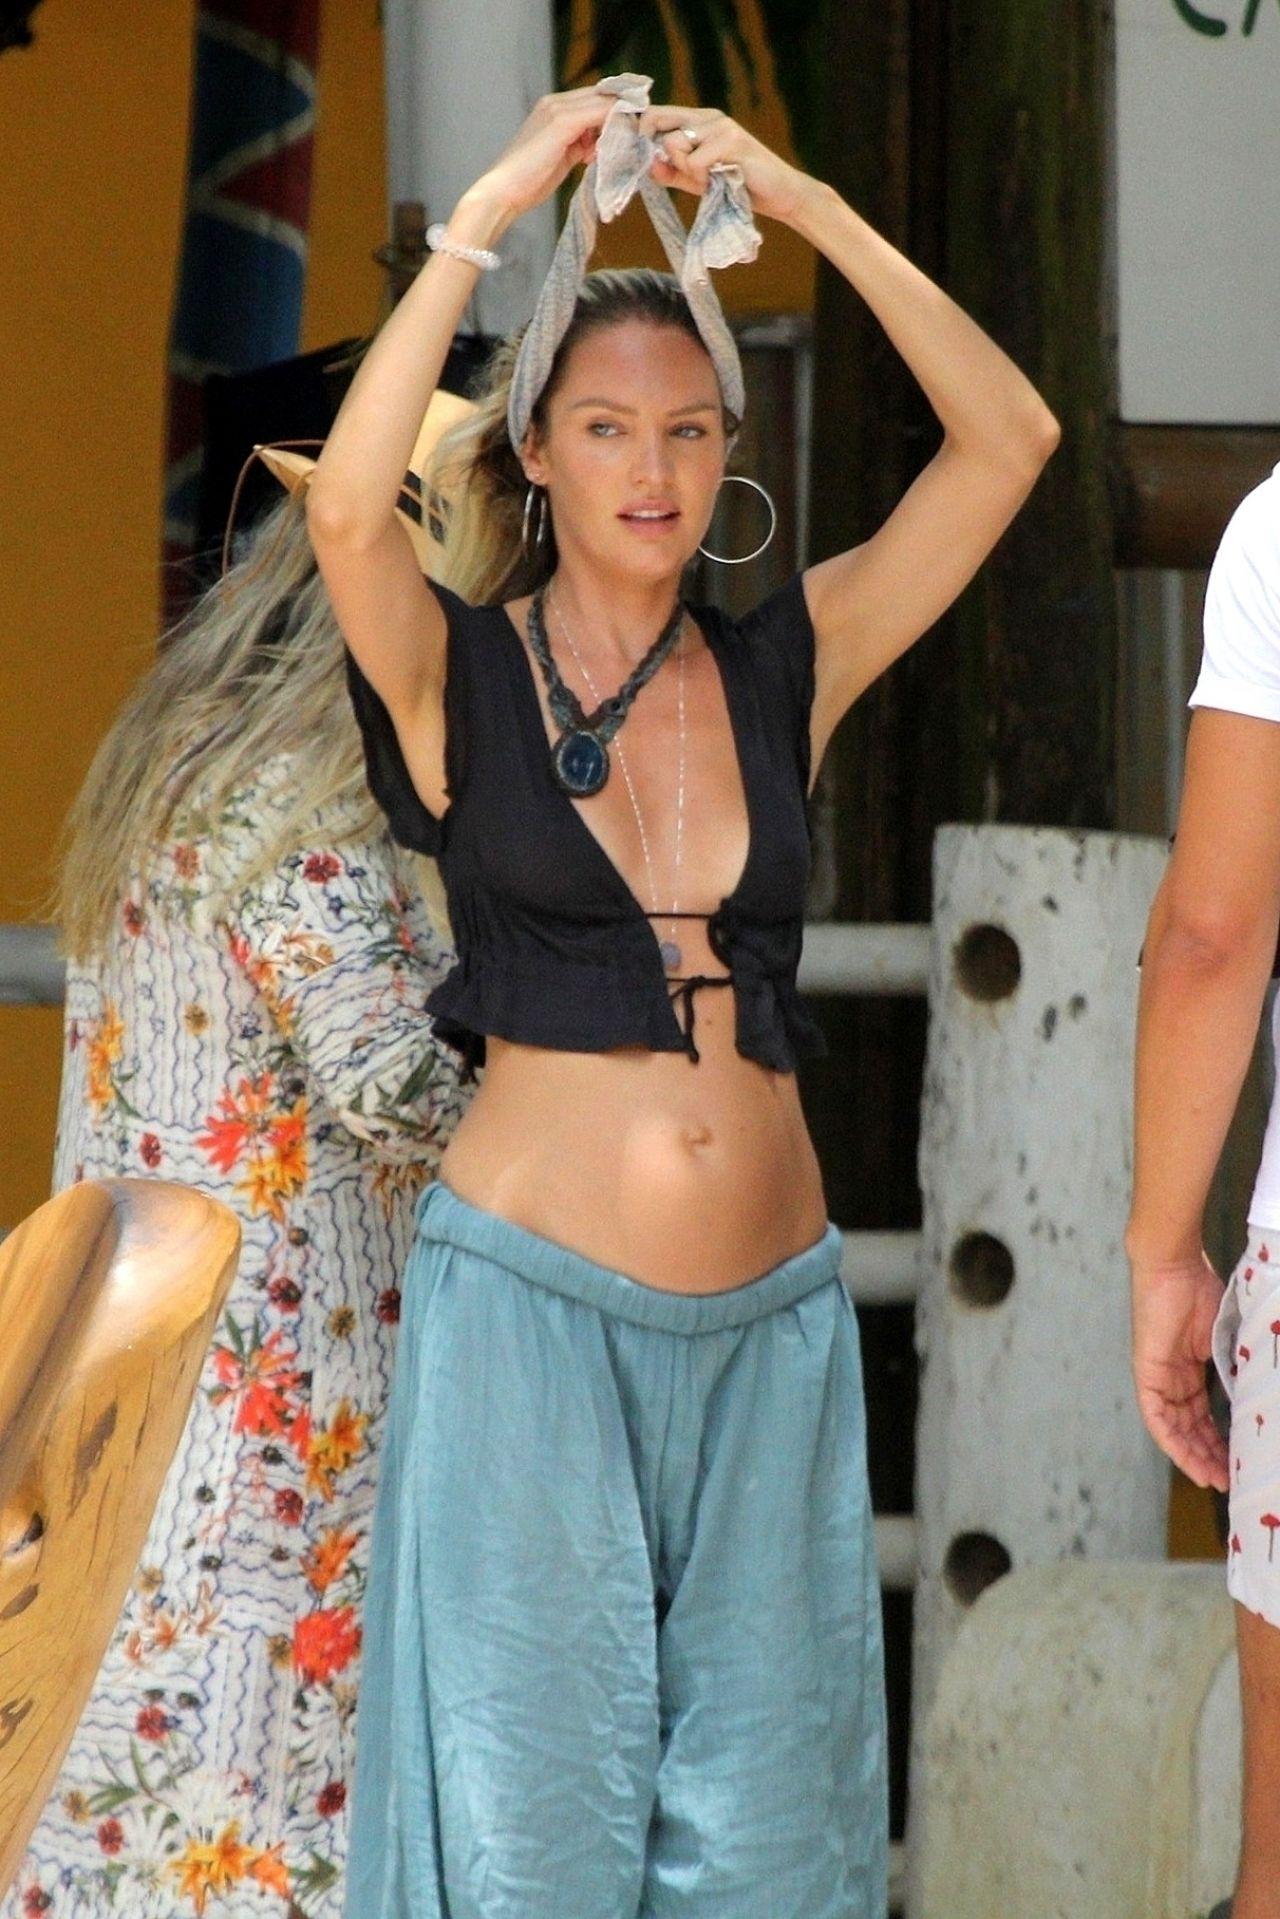 Candice Swanepoel and Doutzen Kroes in Bikini at Espelho Beach in Bahia Pic 10 of 35